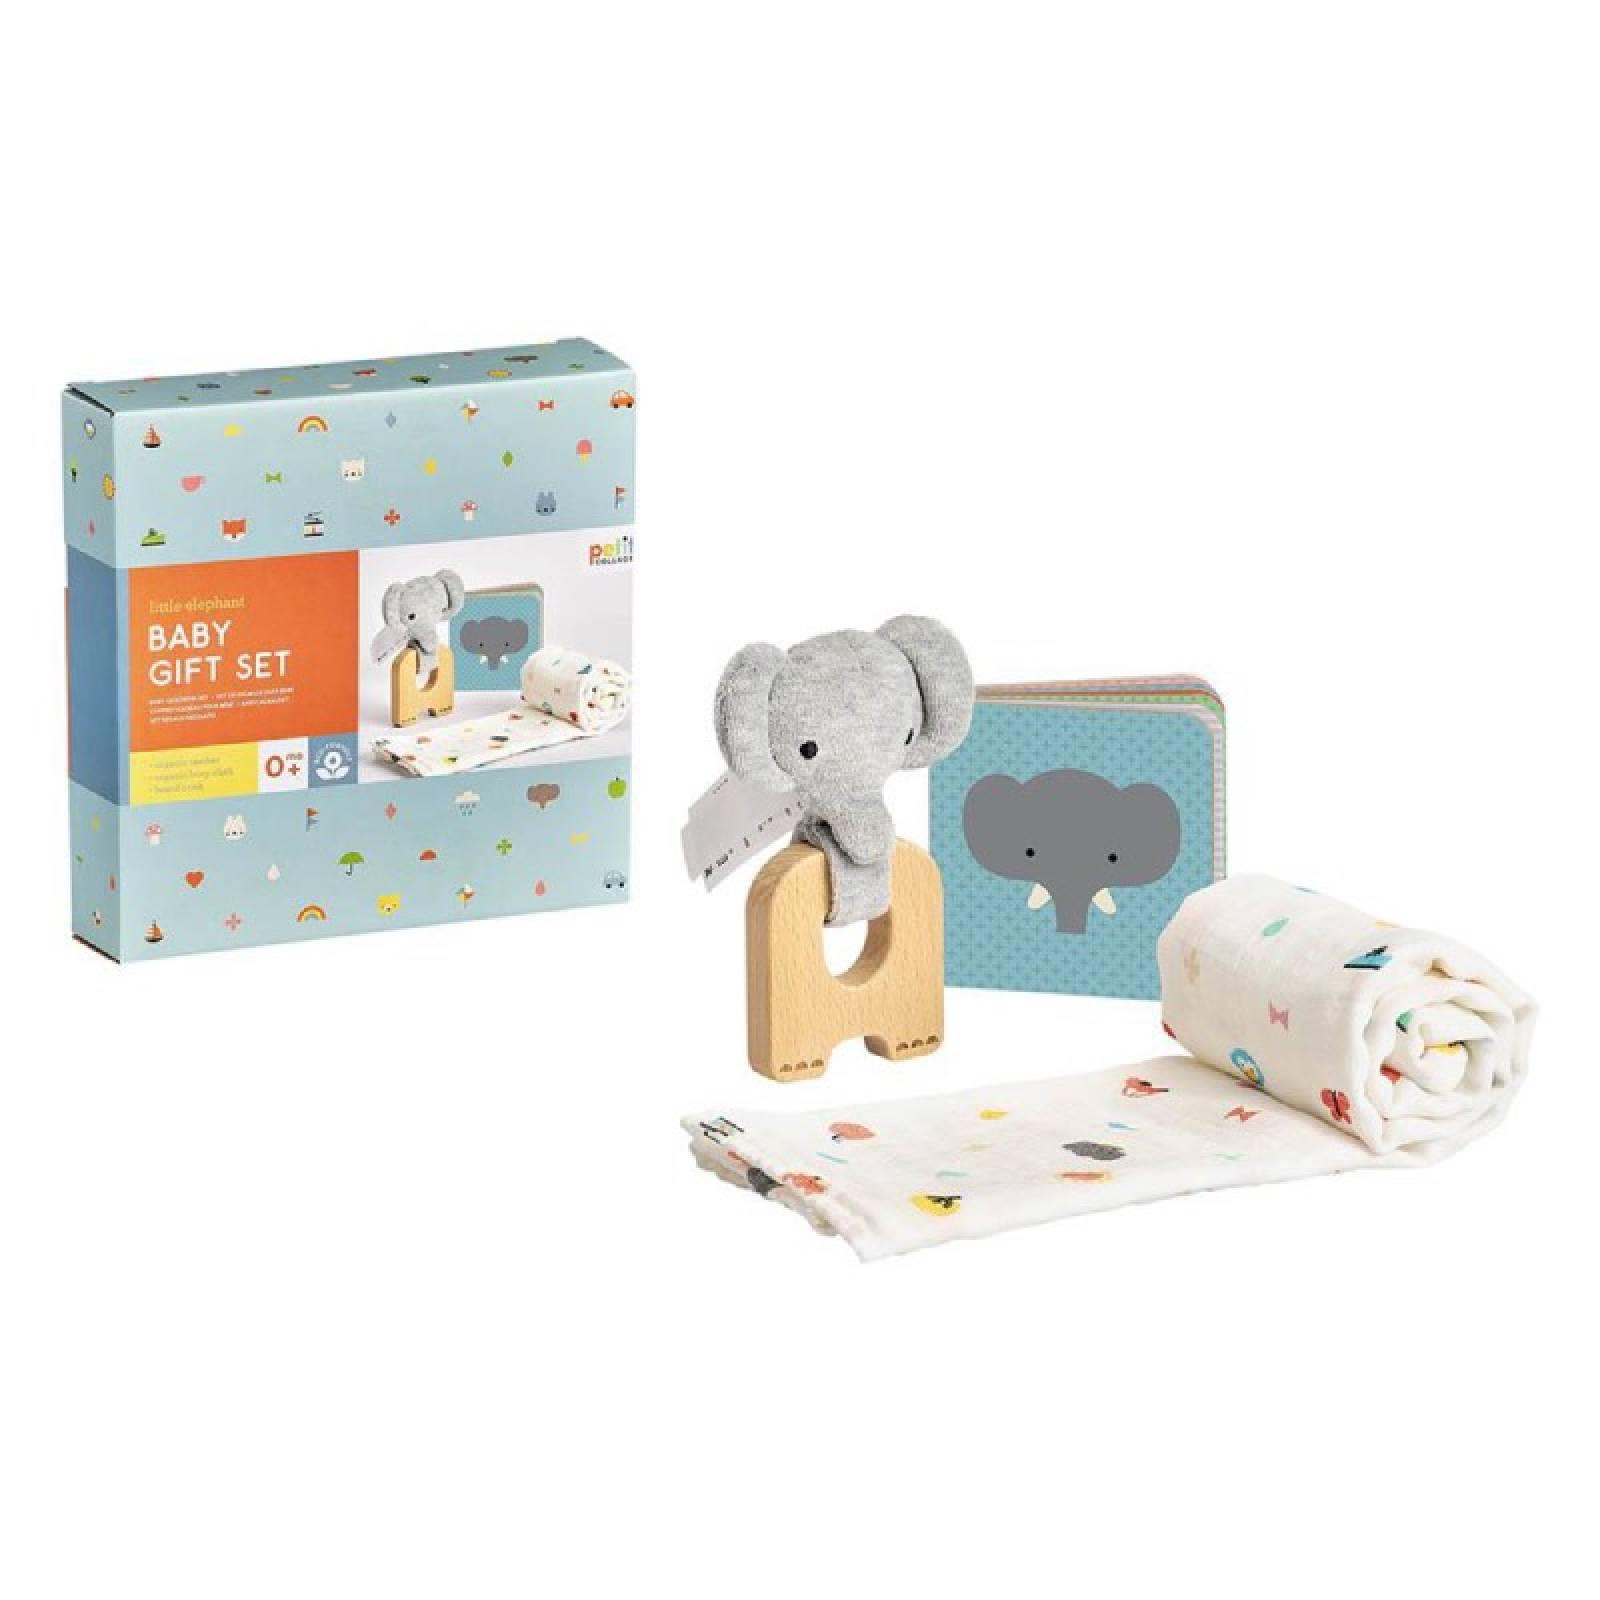 Little Elephant Baby Gift Set 0+ thumbnails